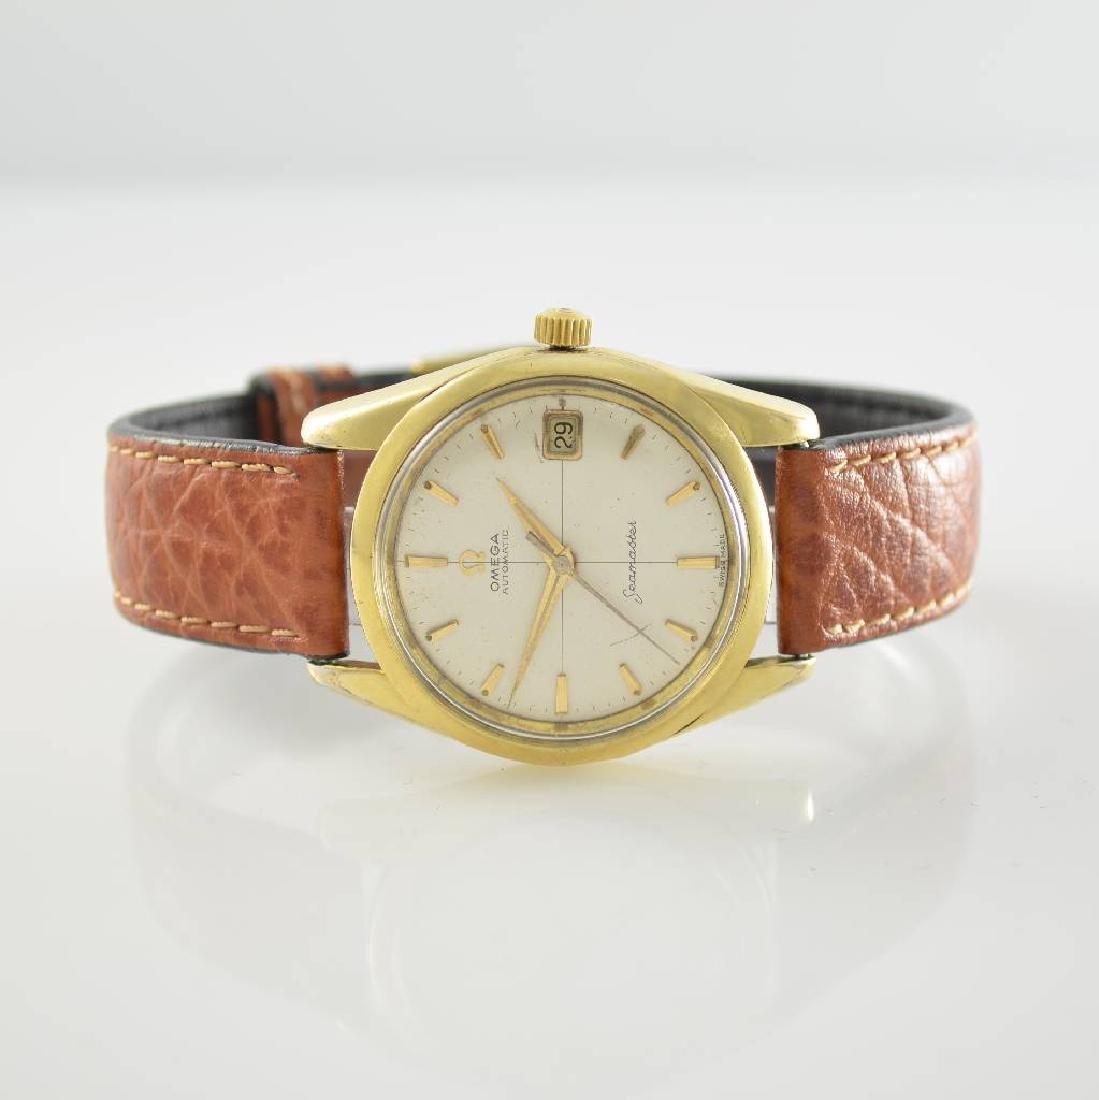 OMEGA self winding gents wristwatch model Seamaster